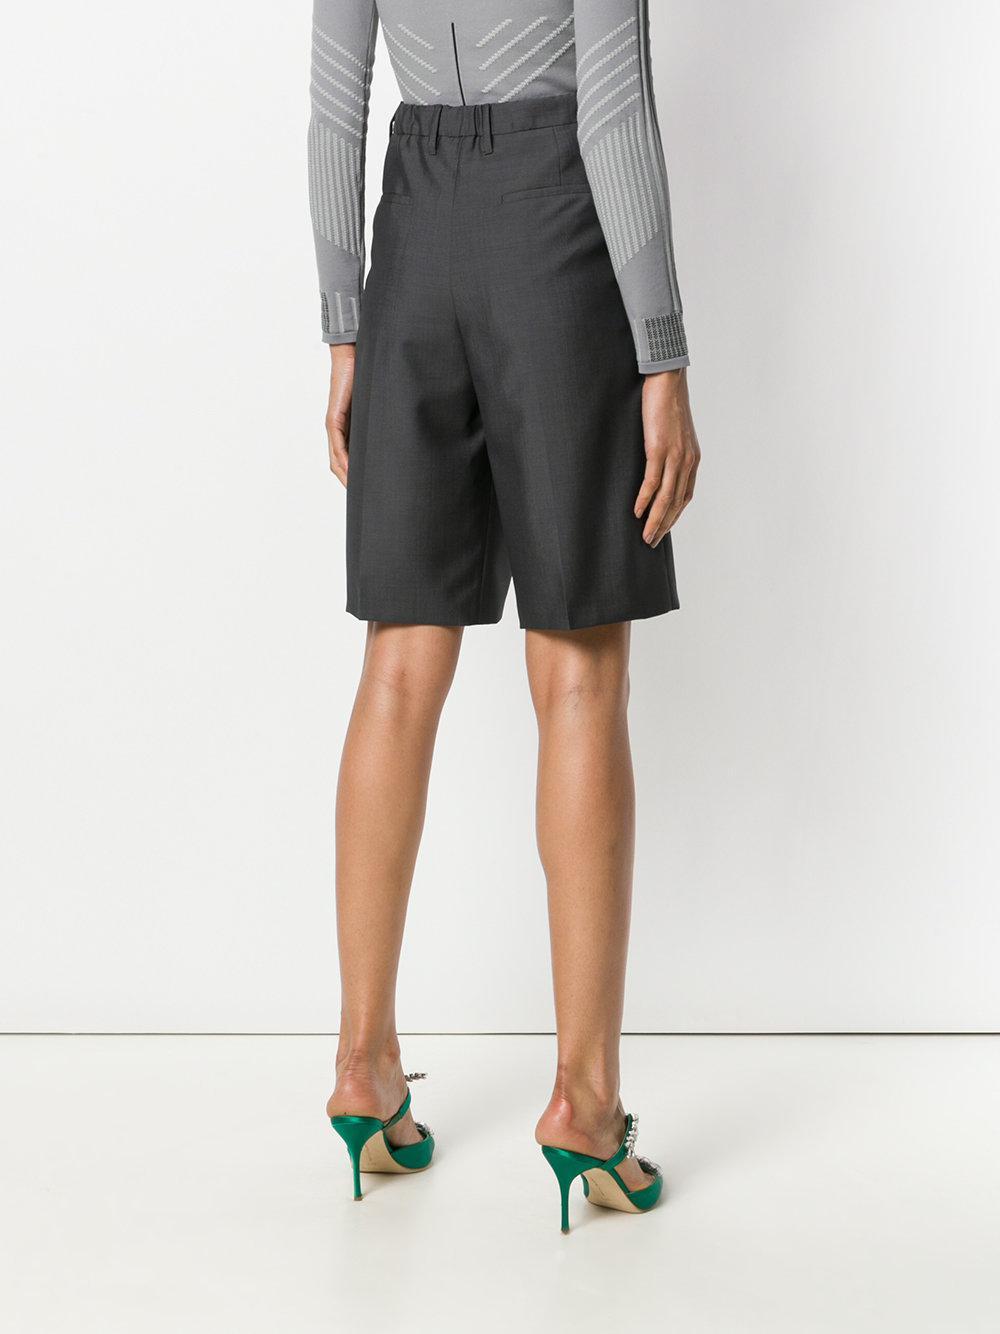 Prada pleated detailing tailored shorts Discount Amazing Price 9xfwM1P